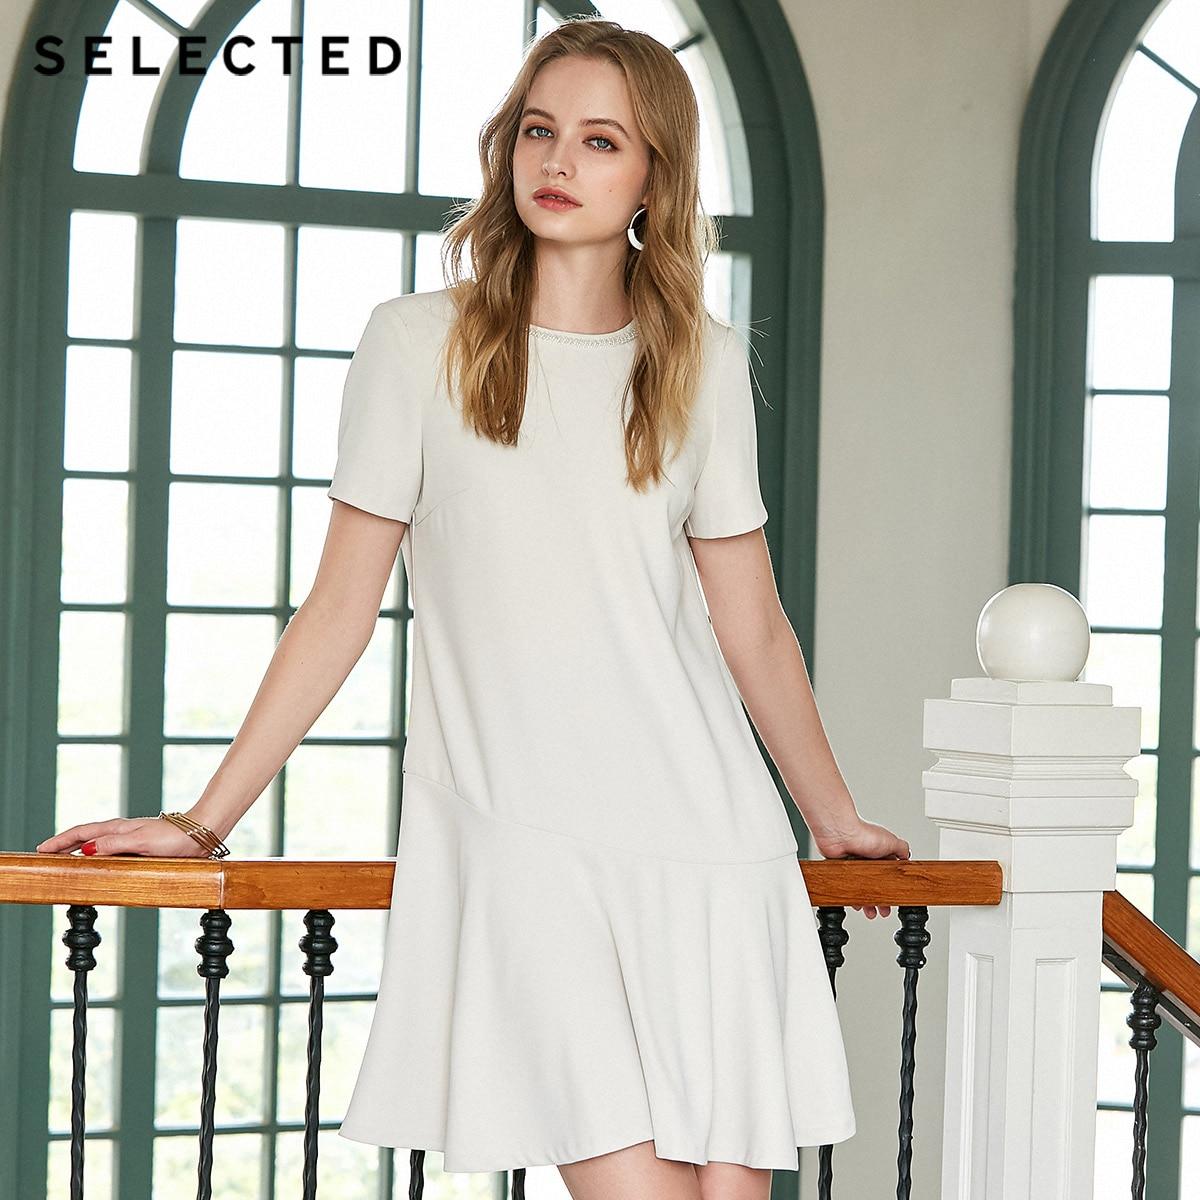 SELECTED Summer Slim Fit Beads Fishtail Dress S 41922J537